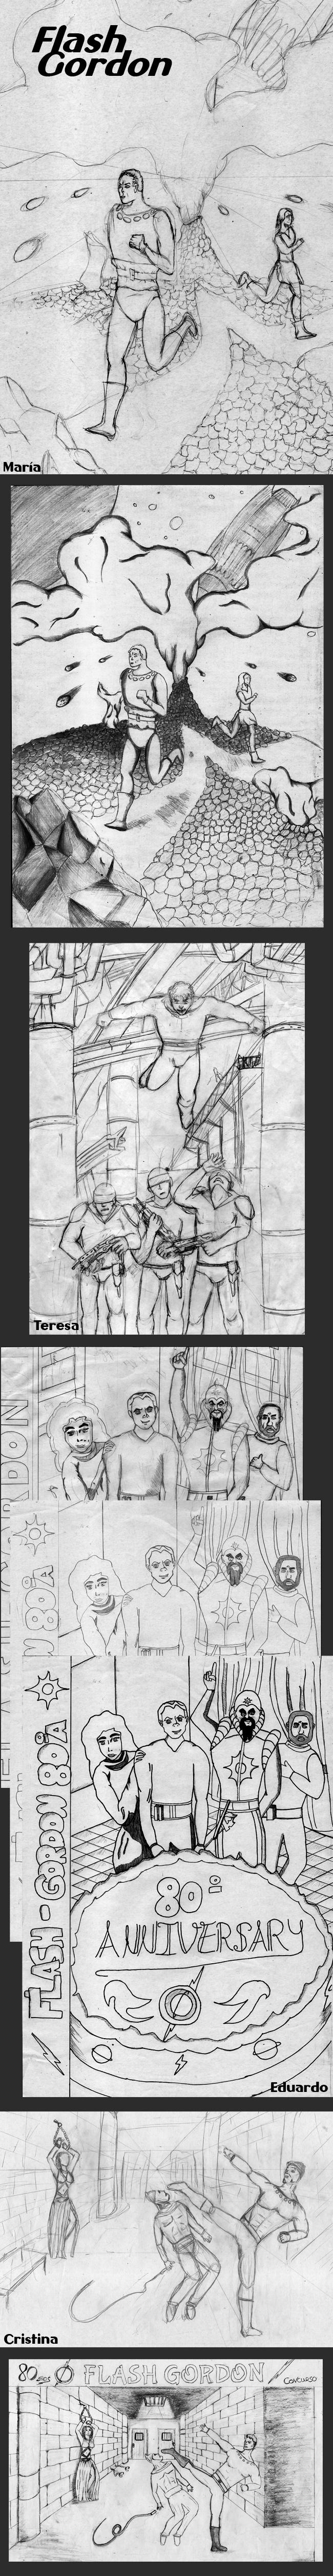 Flash-Gordon-lapiz-tinta-curso-dibujo-academiac10-sabados-concurso-madrid